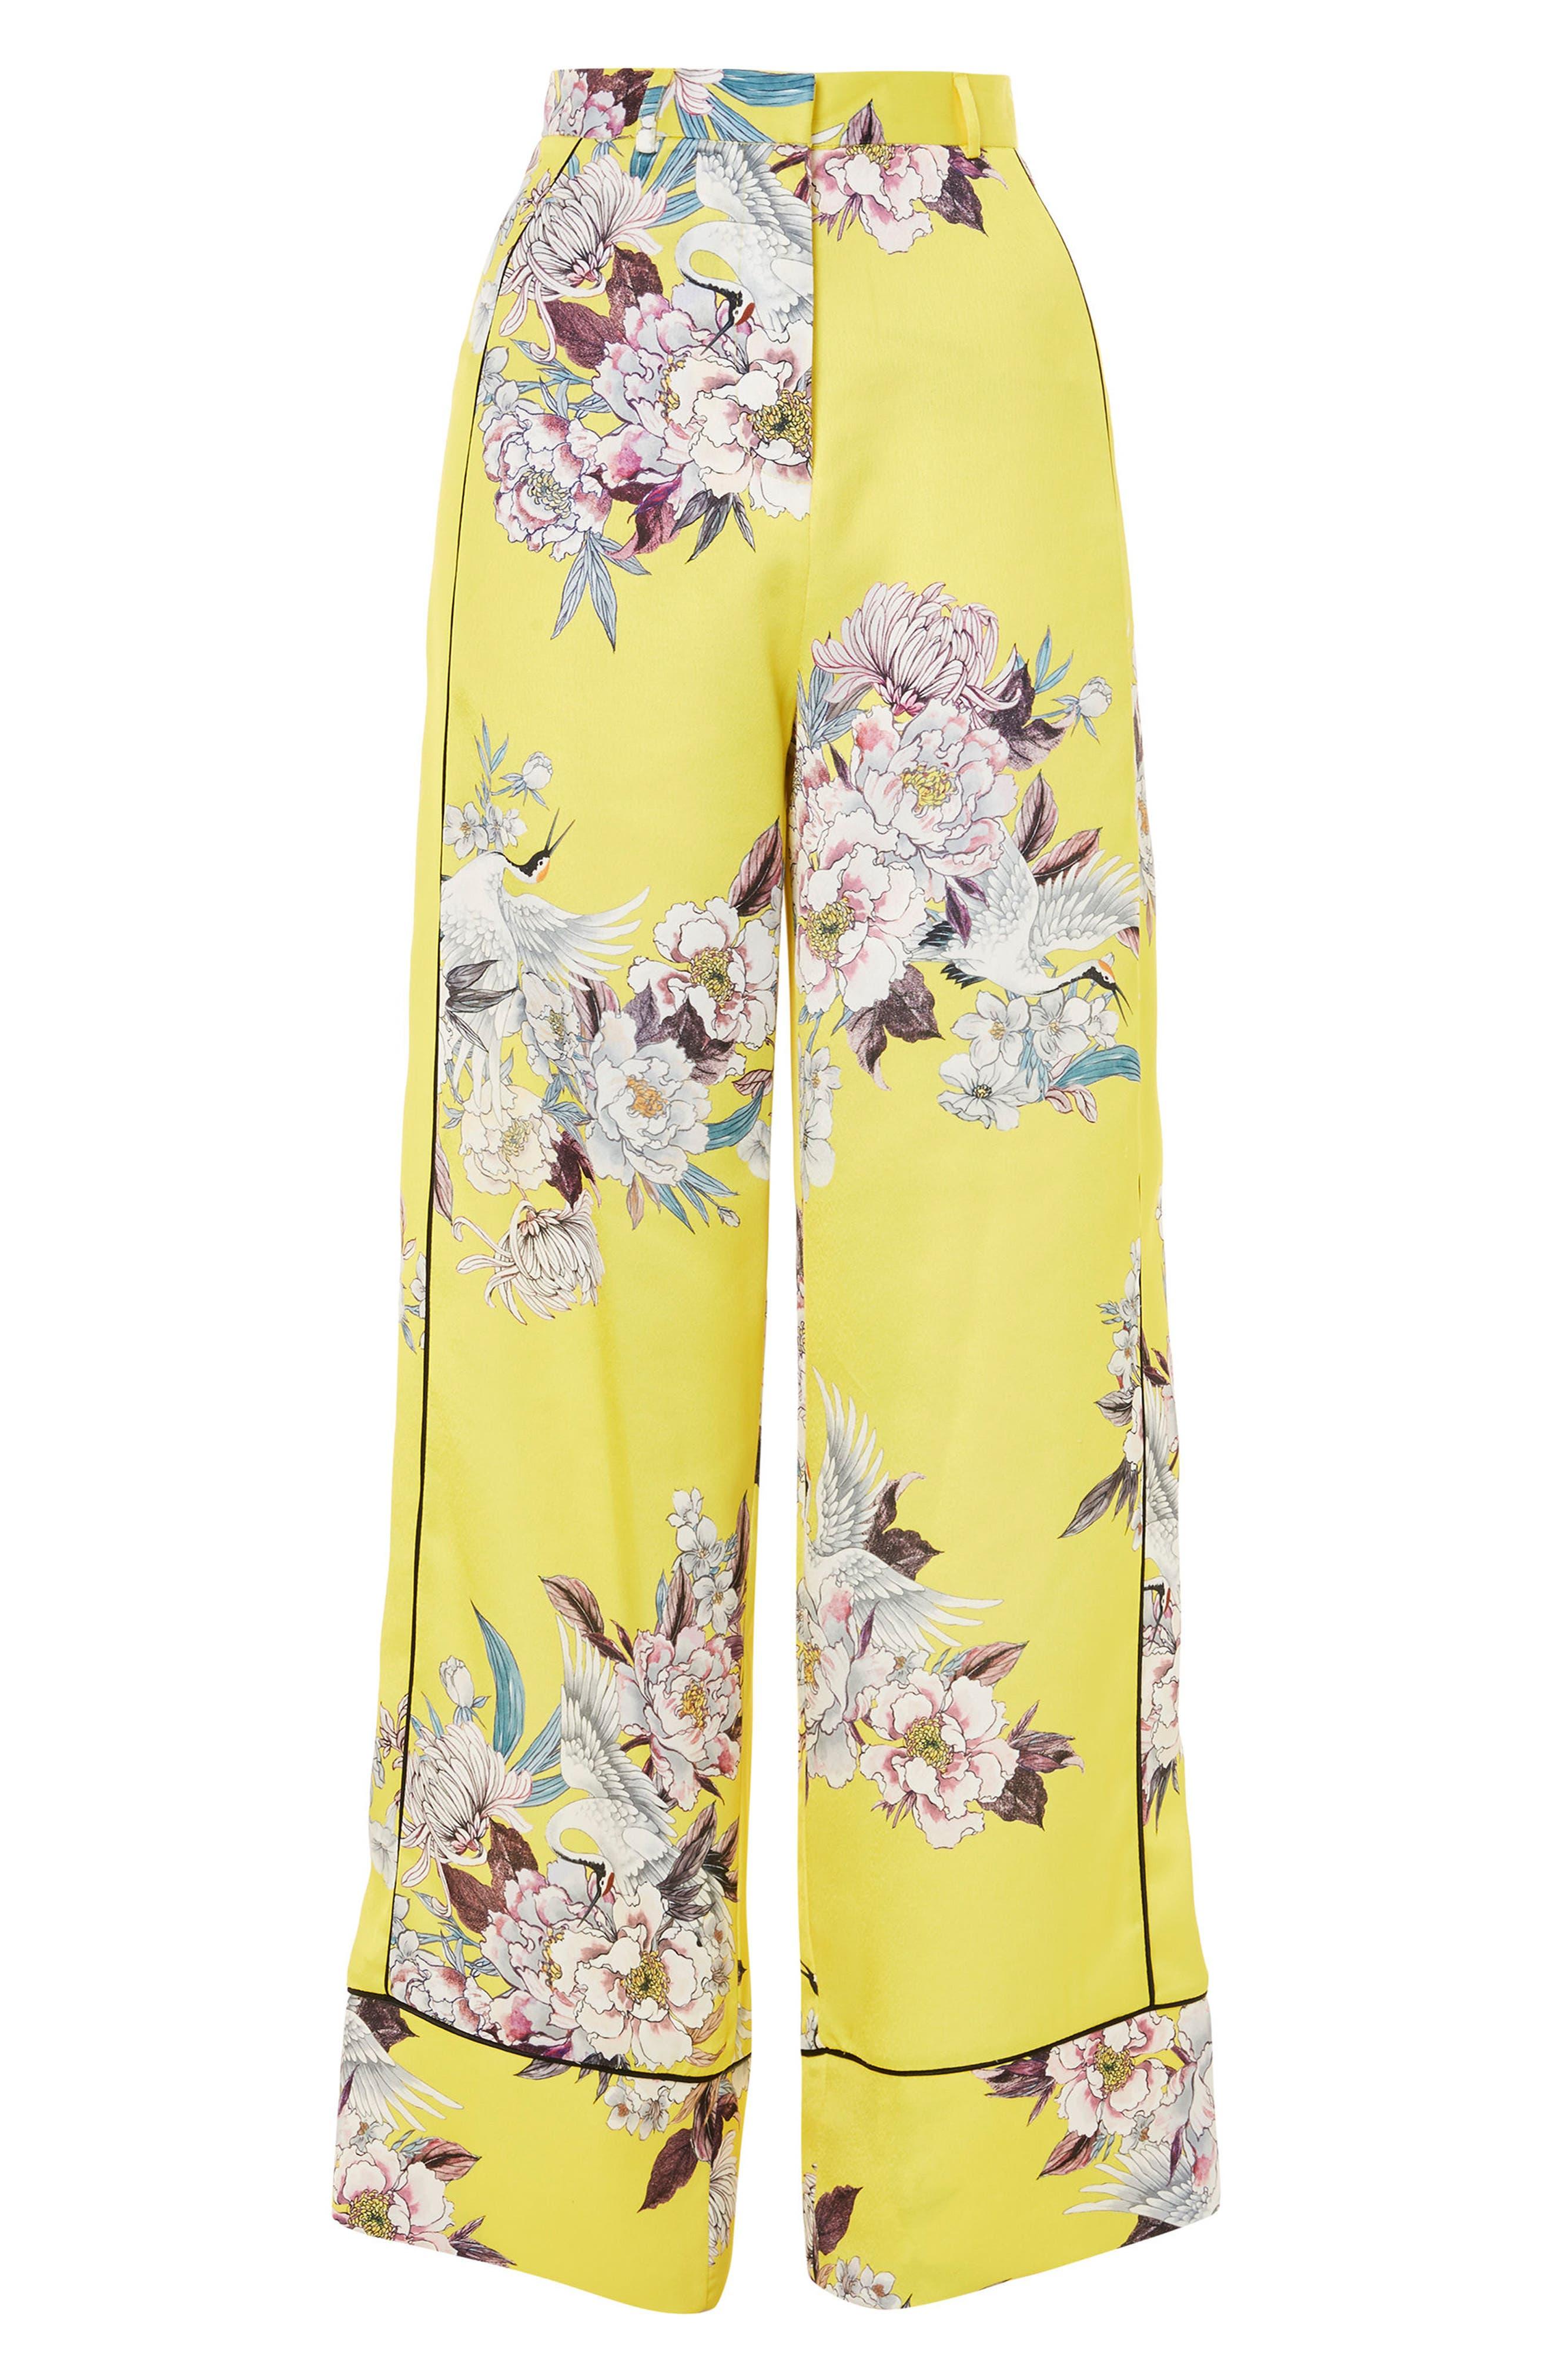 Heron Pajama Wide Leg Trousers,                             Alternate thumbnail 4, color,                             Yellow Multi